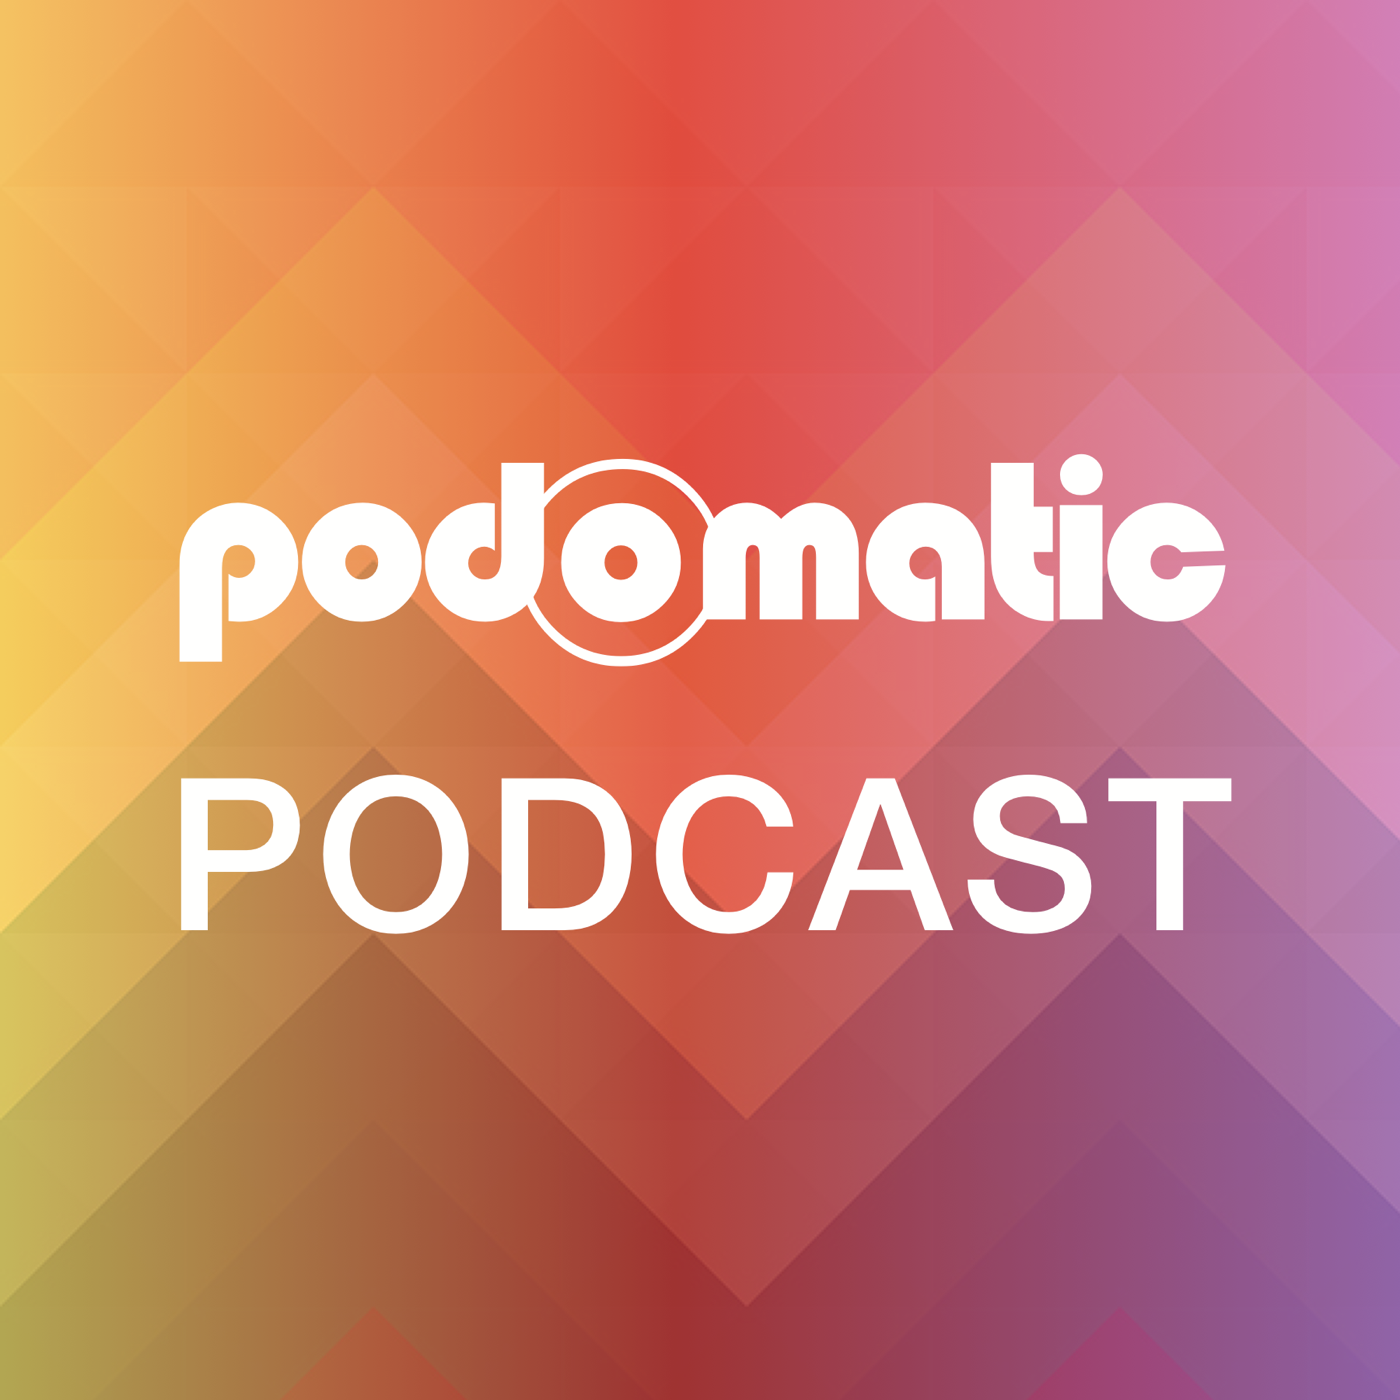 Benjamin Spiegel's Podcast